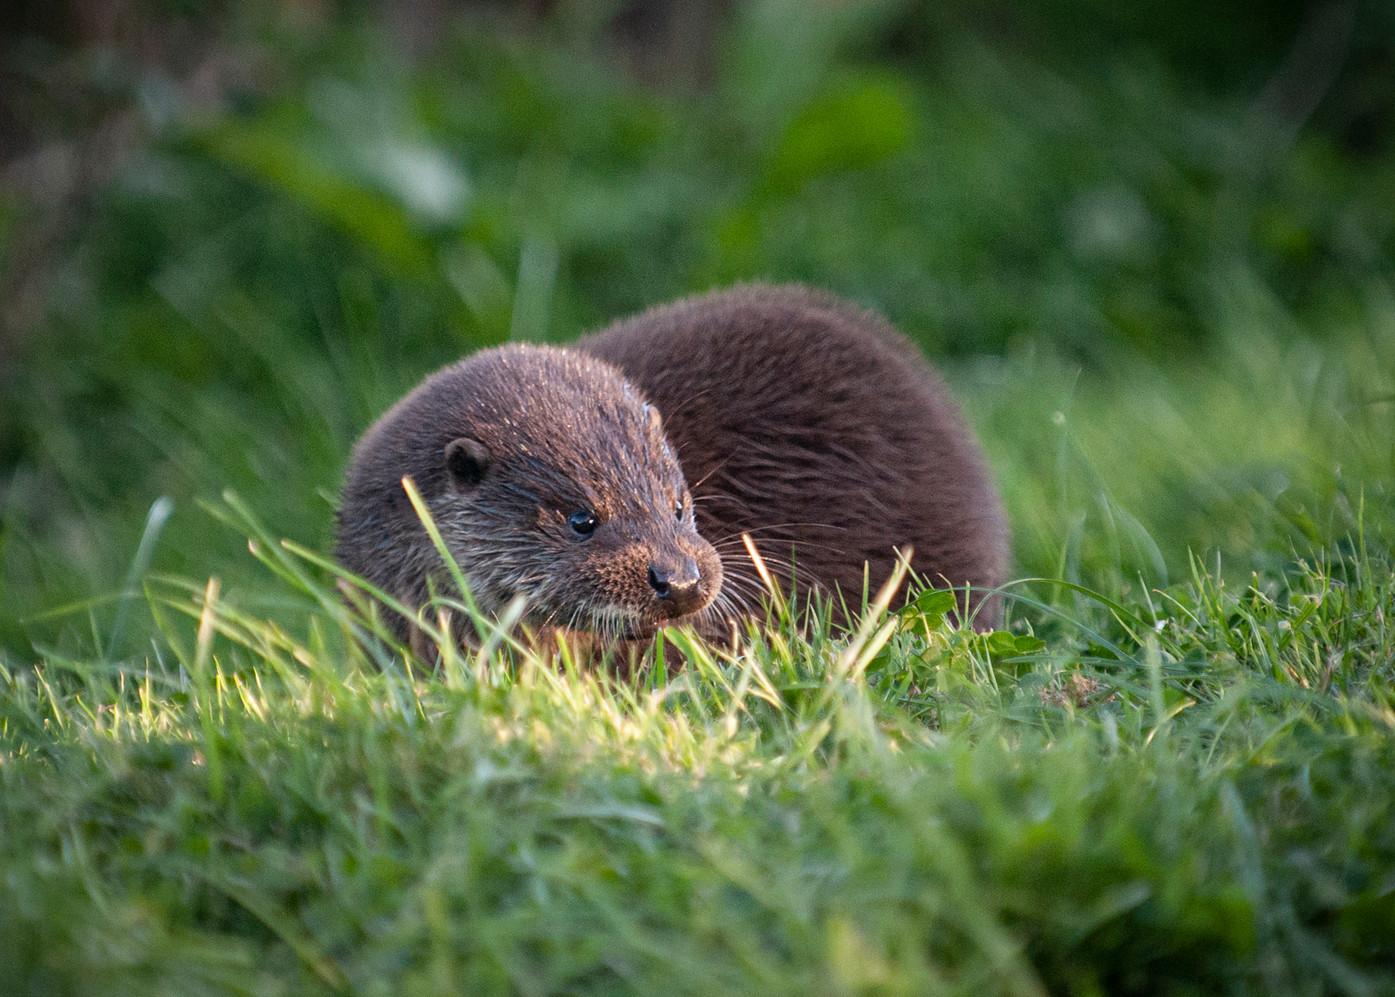 2009.08.09_BWC_British Wildlife Centre_1